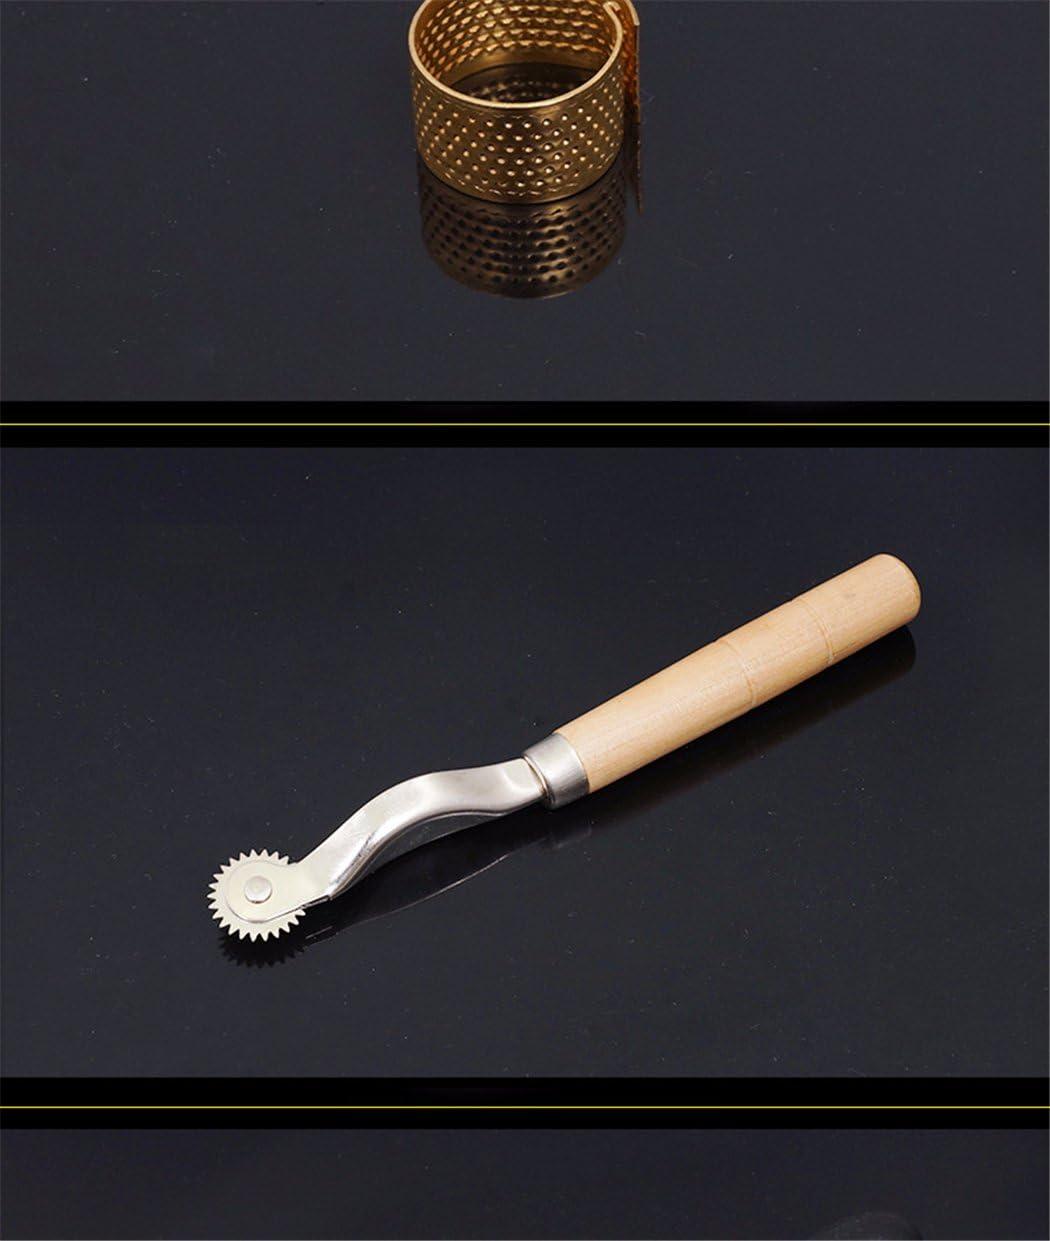 SALAKA TPR Mango de Goma Suave Ganchos de Ganchillo Juego de Agujas de Aluminio para Hacer Punto Gancho Doble Juego de Ganchos de Ganchillo